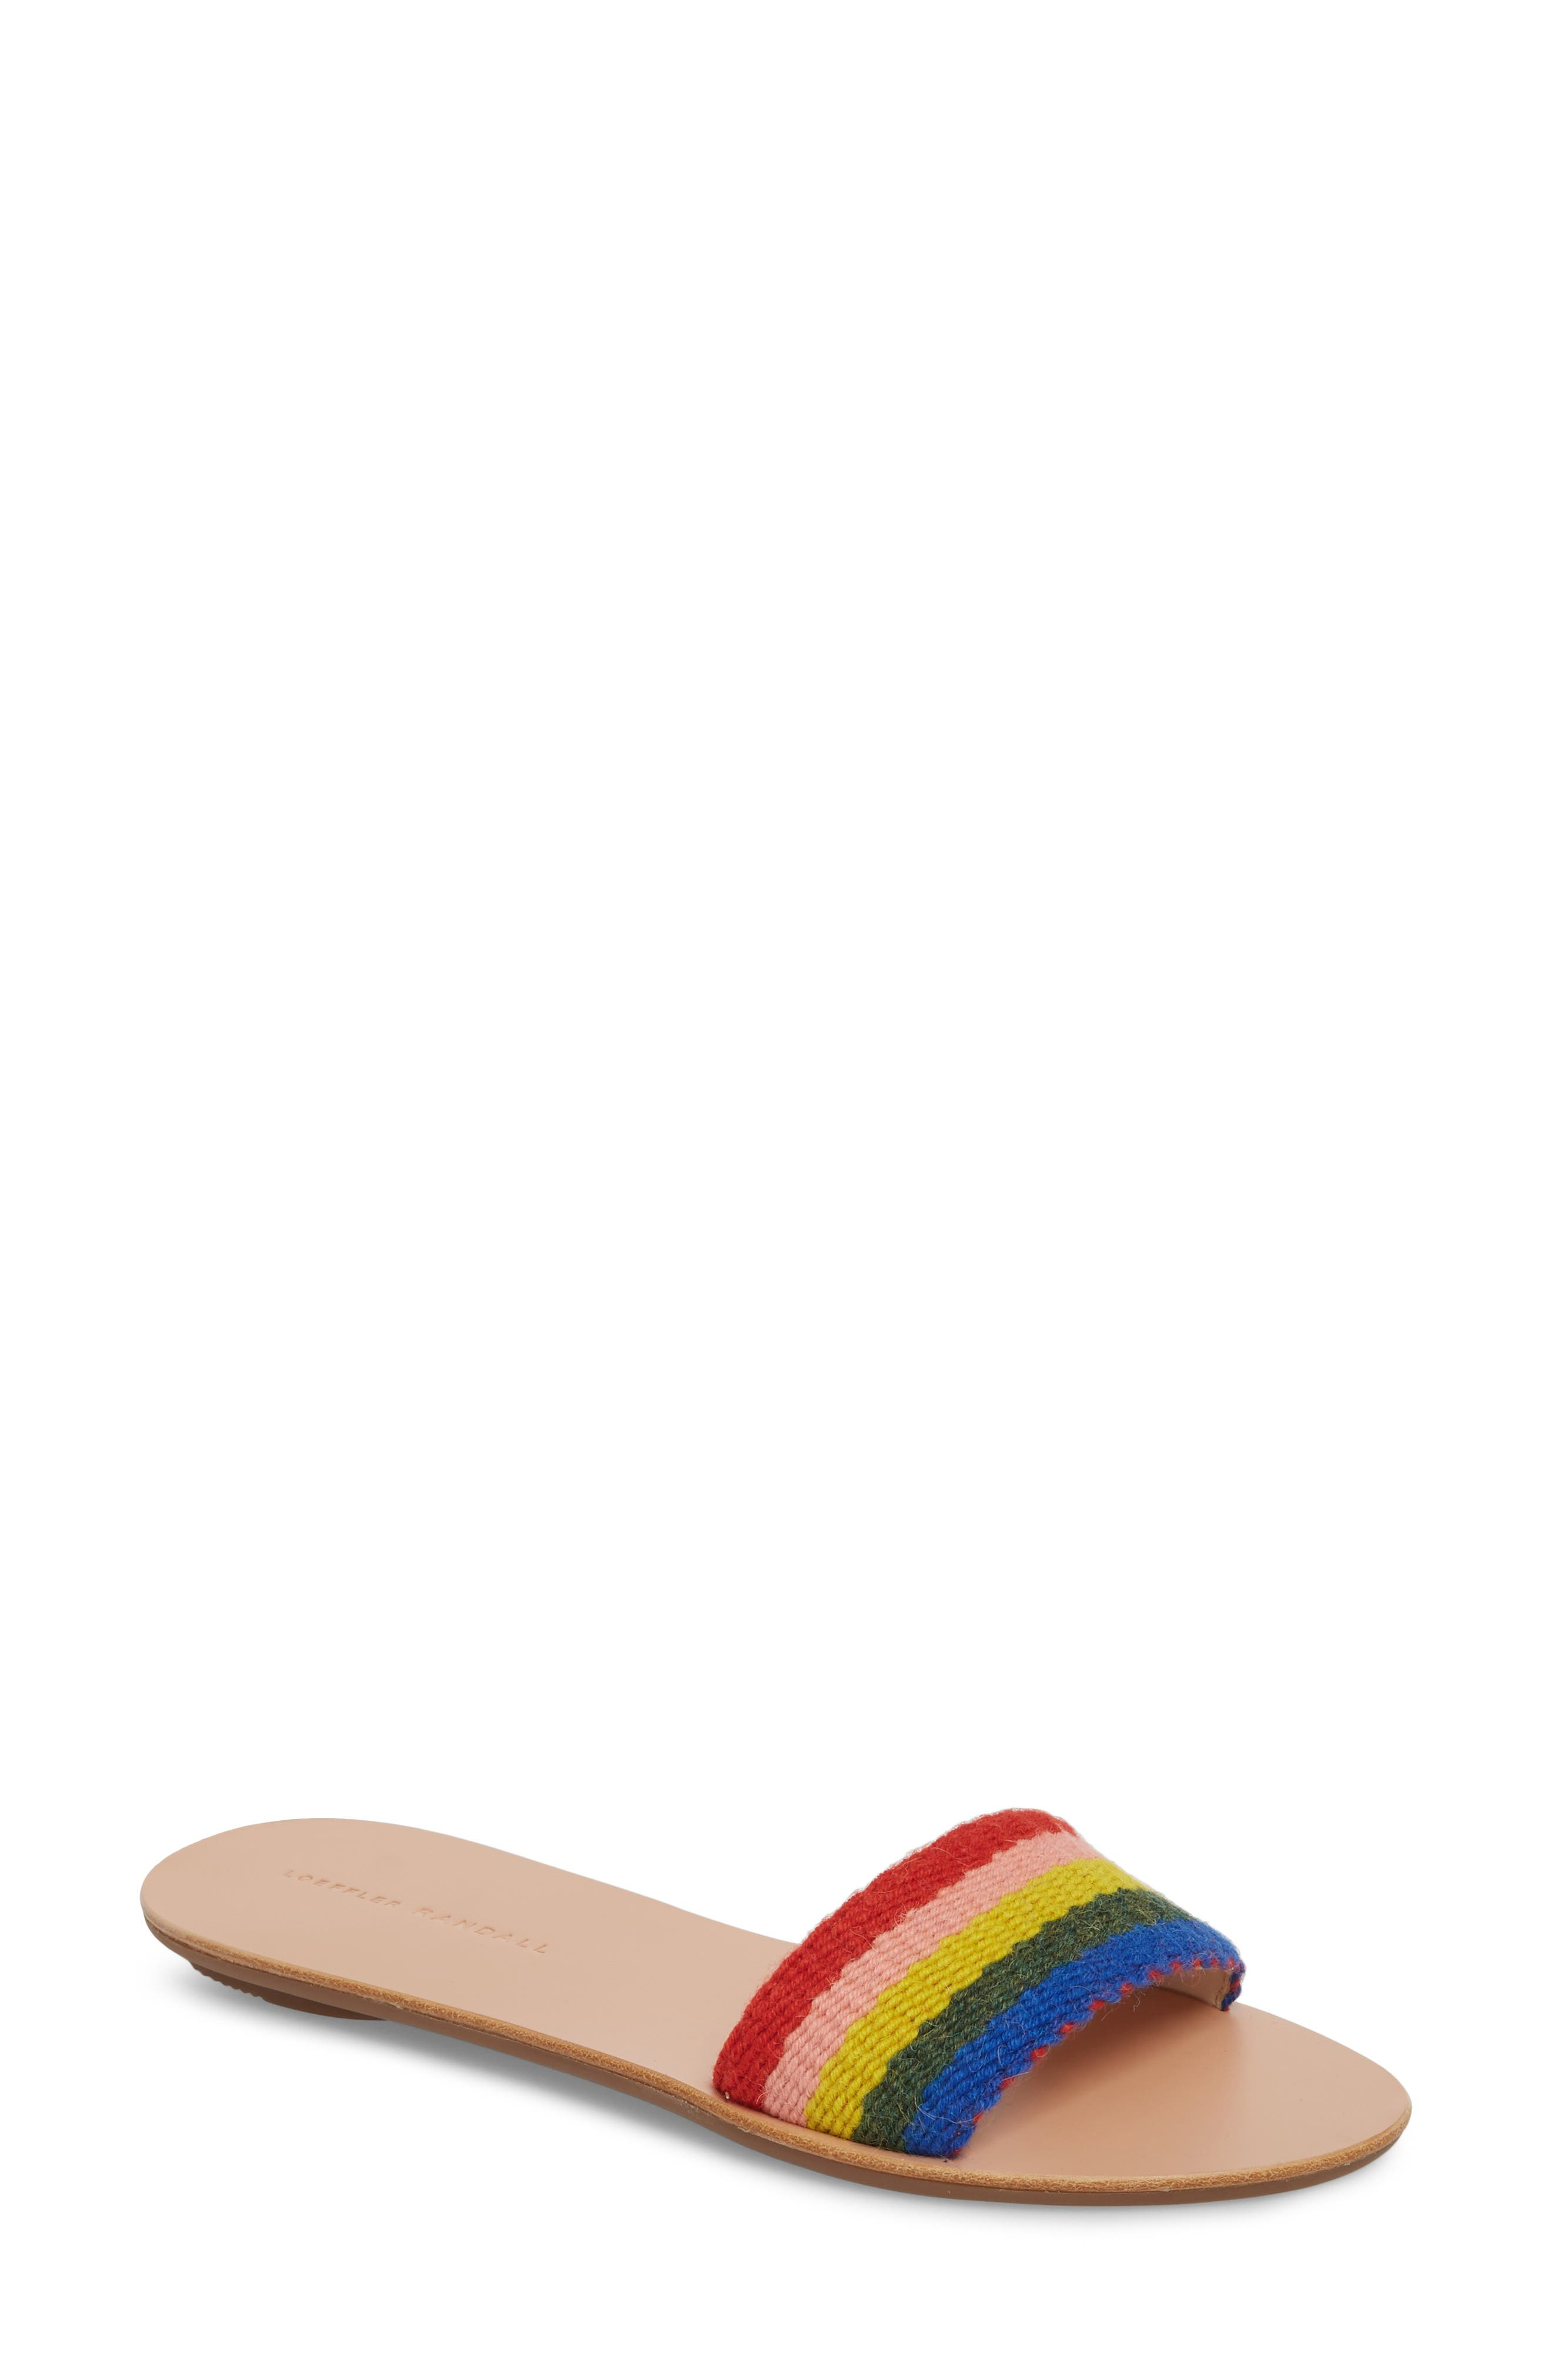 Stella Woven Slide Sandal,                             Main thumbnail 1, color,                             Rainbow Fabric